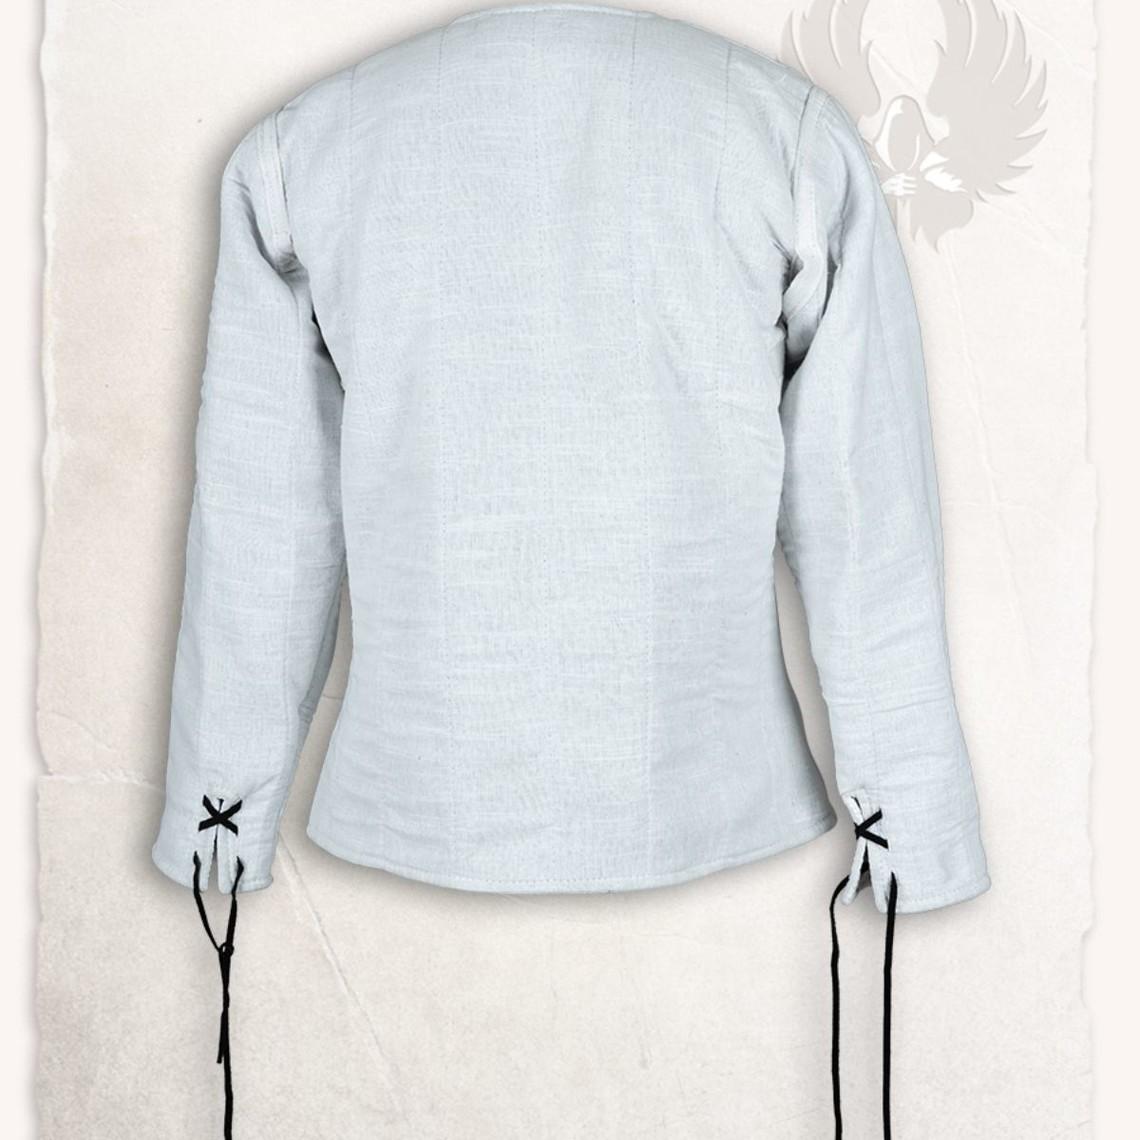 Mytholon Lino gambeson Aulber bianco